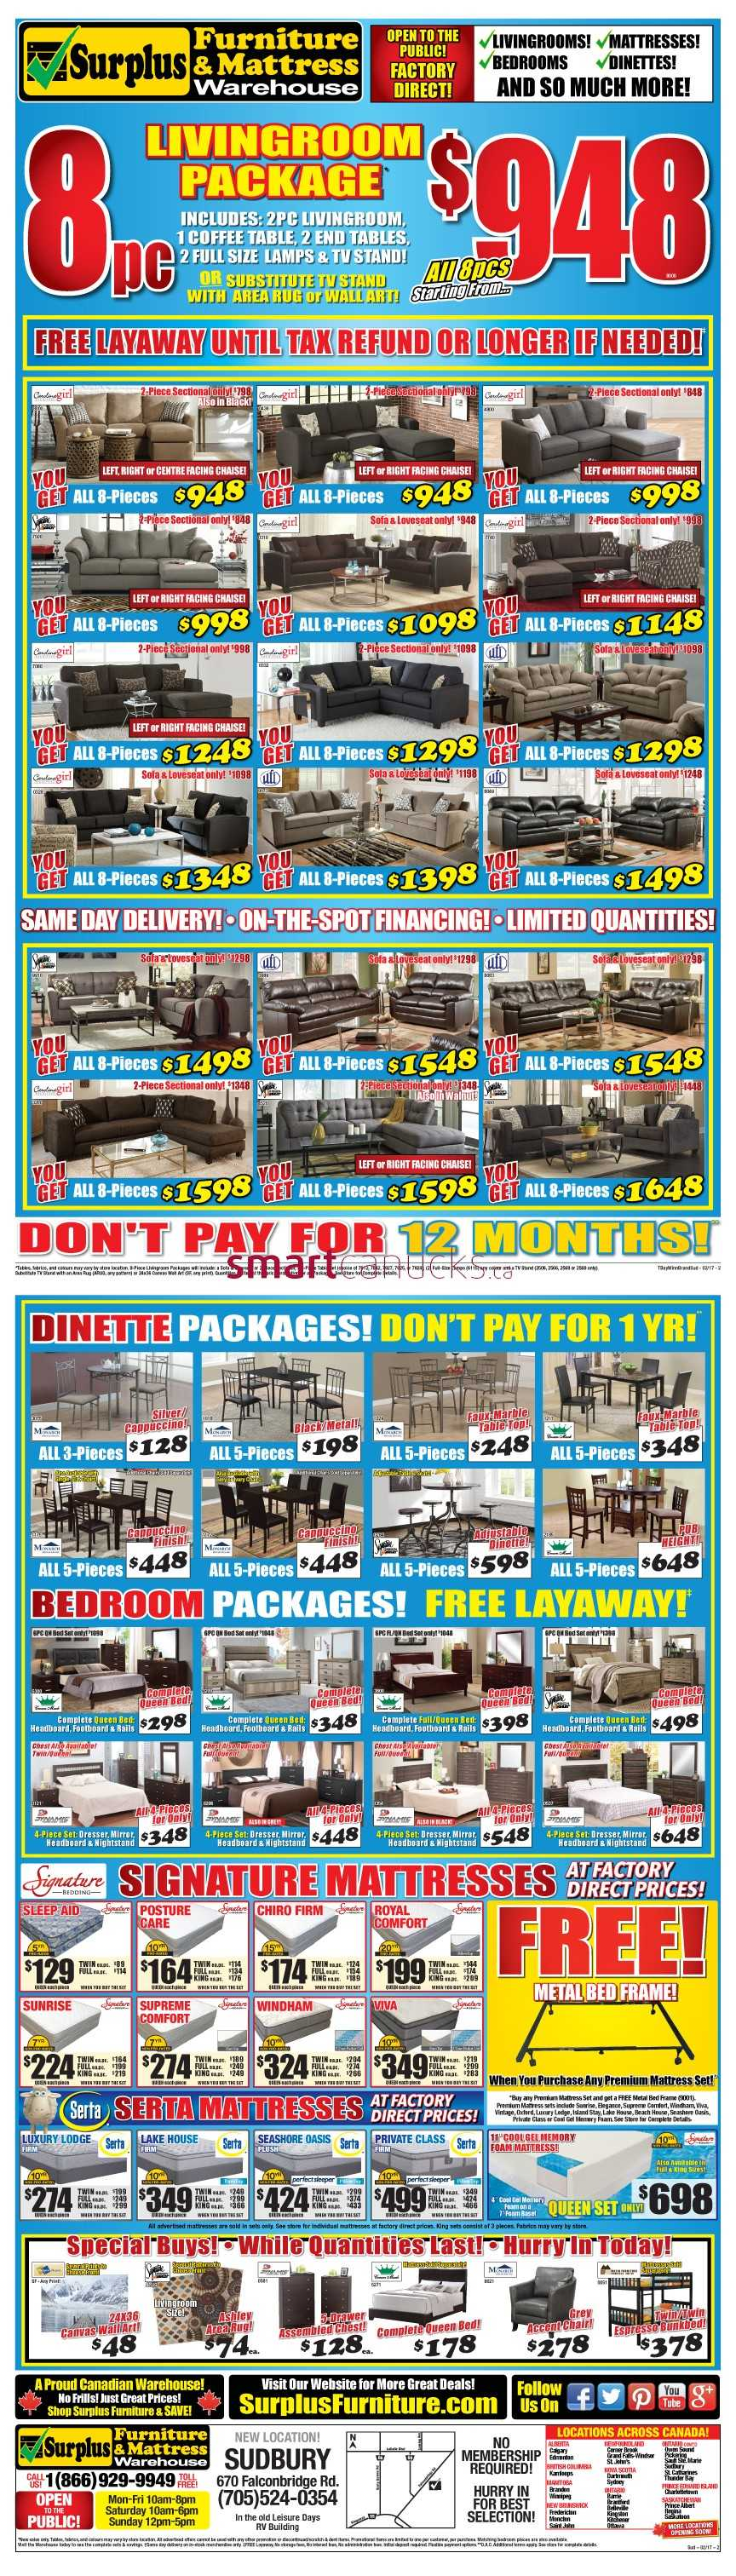 Surplus Furniture Mattress Warehouse Sudbury Flyer February 7 To 27